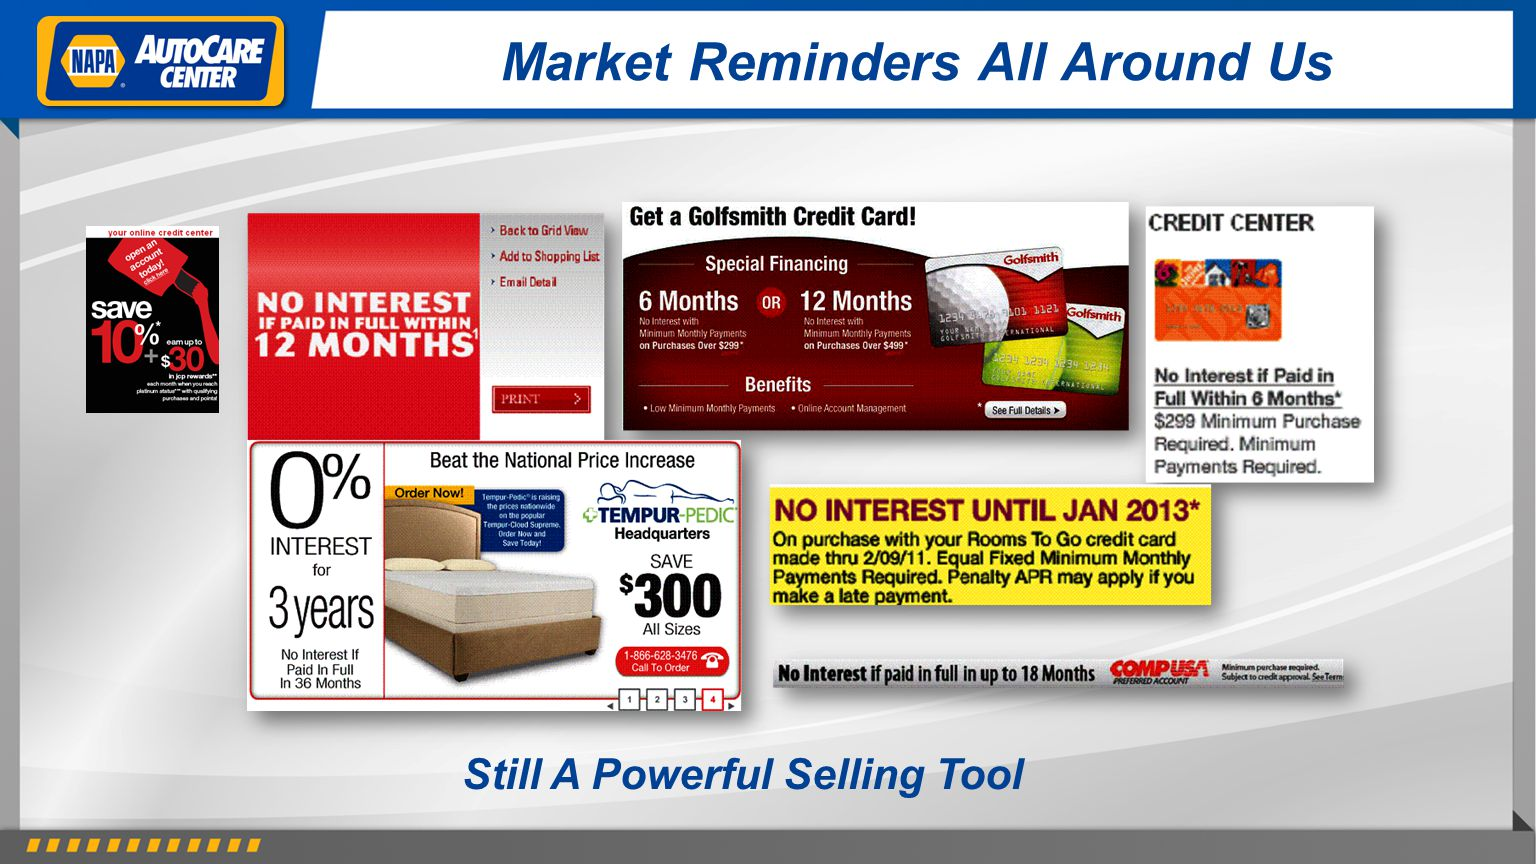 Market Reminders All Around Us